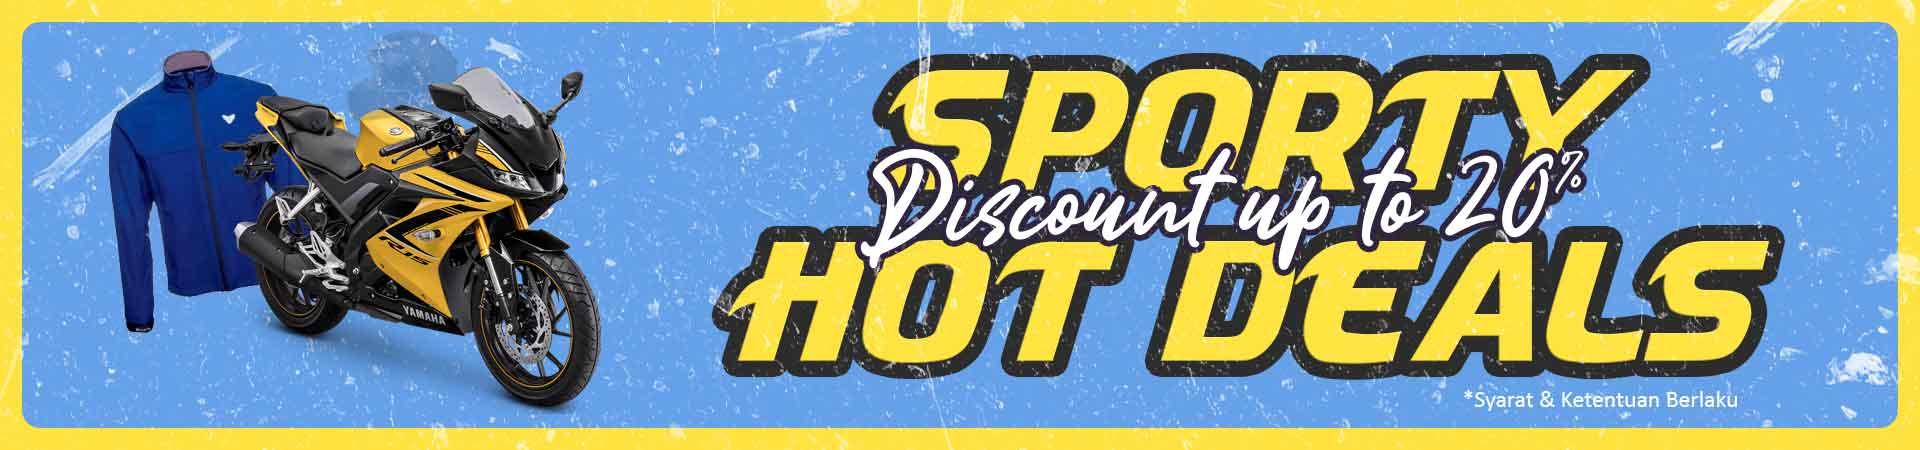 Sport Hot Deals! Diskon Motor, Helm, Masker, dan Jaket Sport